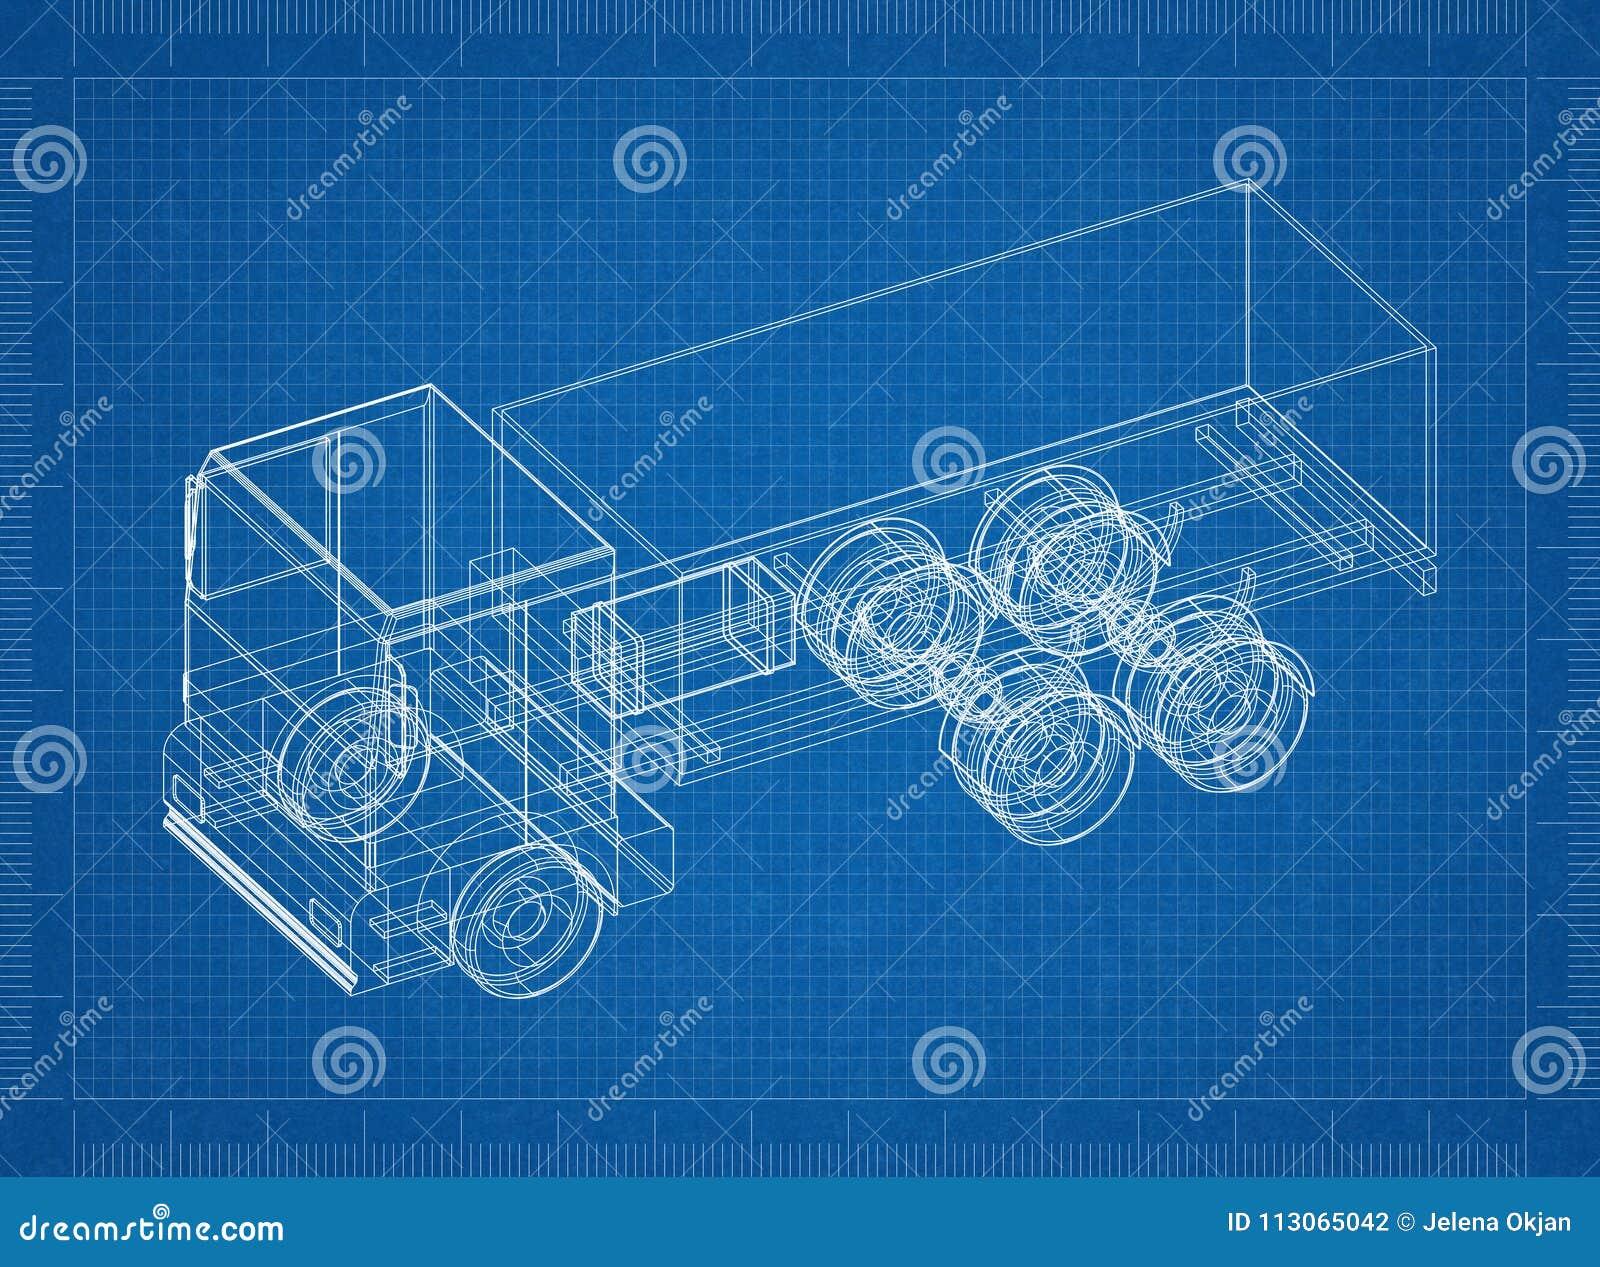 Truck 3d blueprint stock illustration illustration of highway truck 3d blueprint highway cargo royalty free illustration malvernweather Gallery